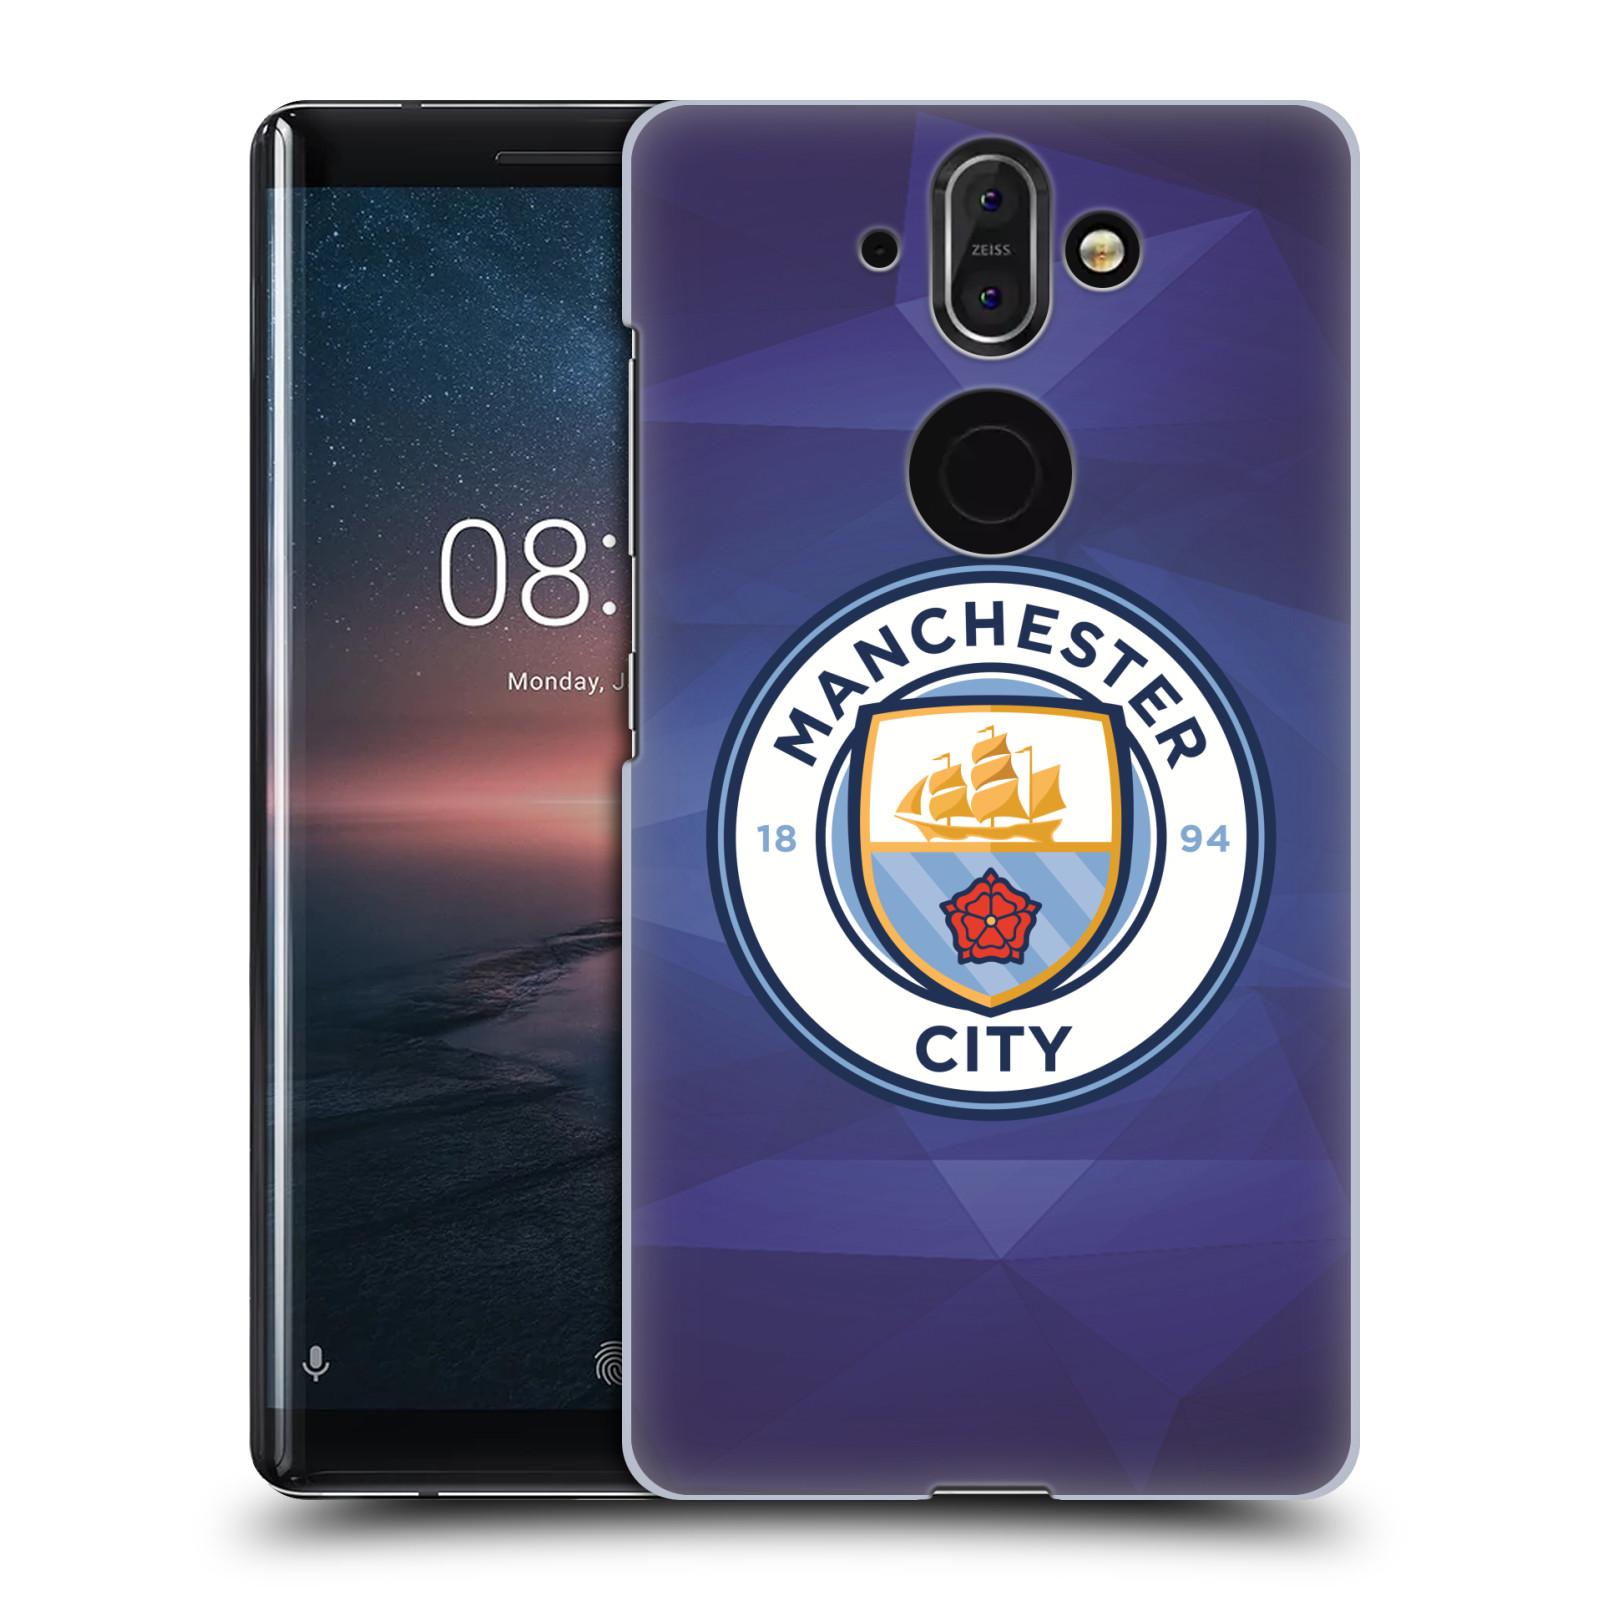 Plastové pouzdro na mobil Nokia 8 Sirocco - Head Case - Manchester City FC - Modré nové logo